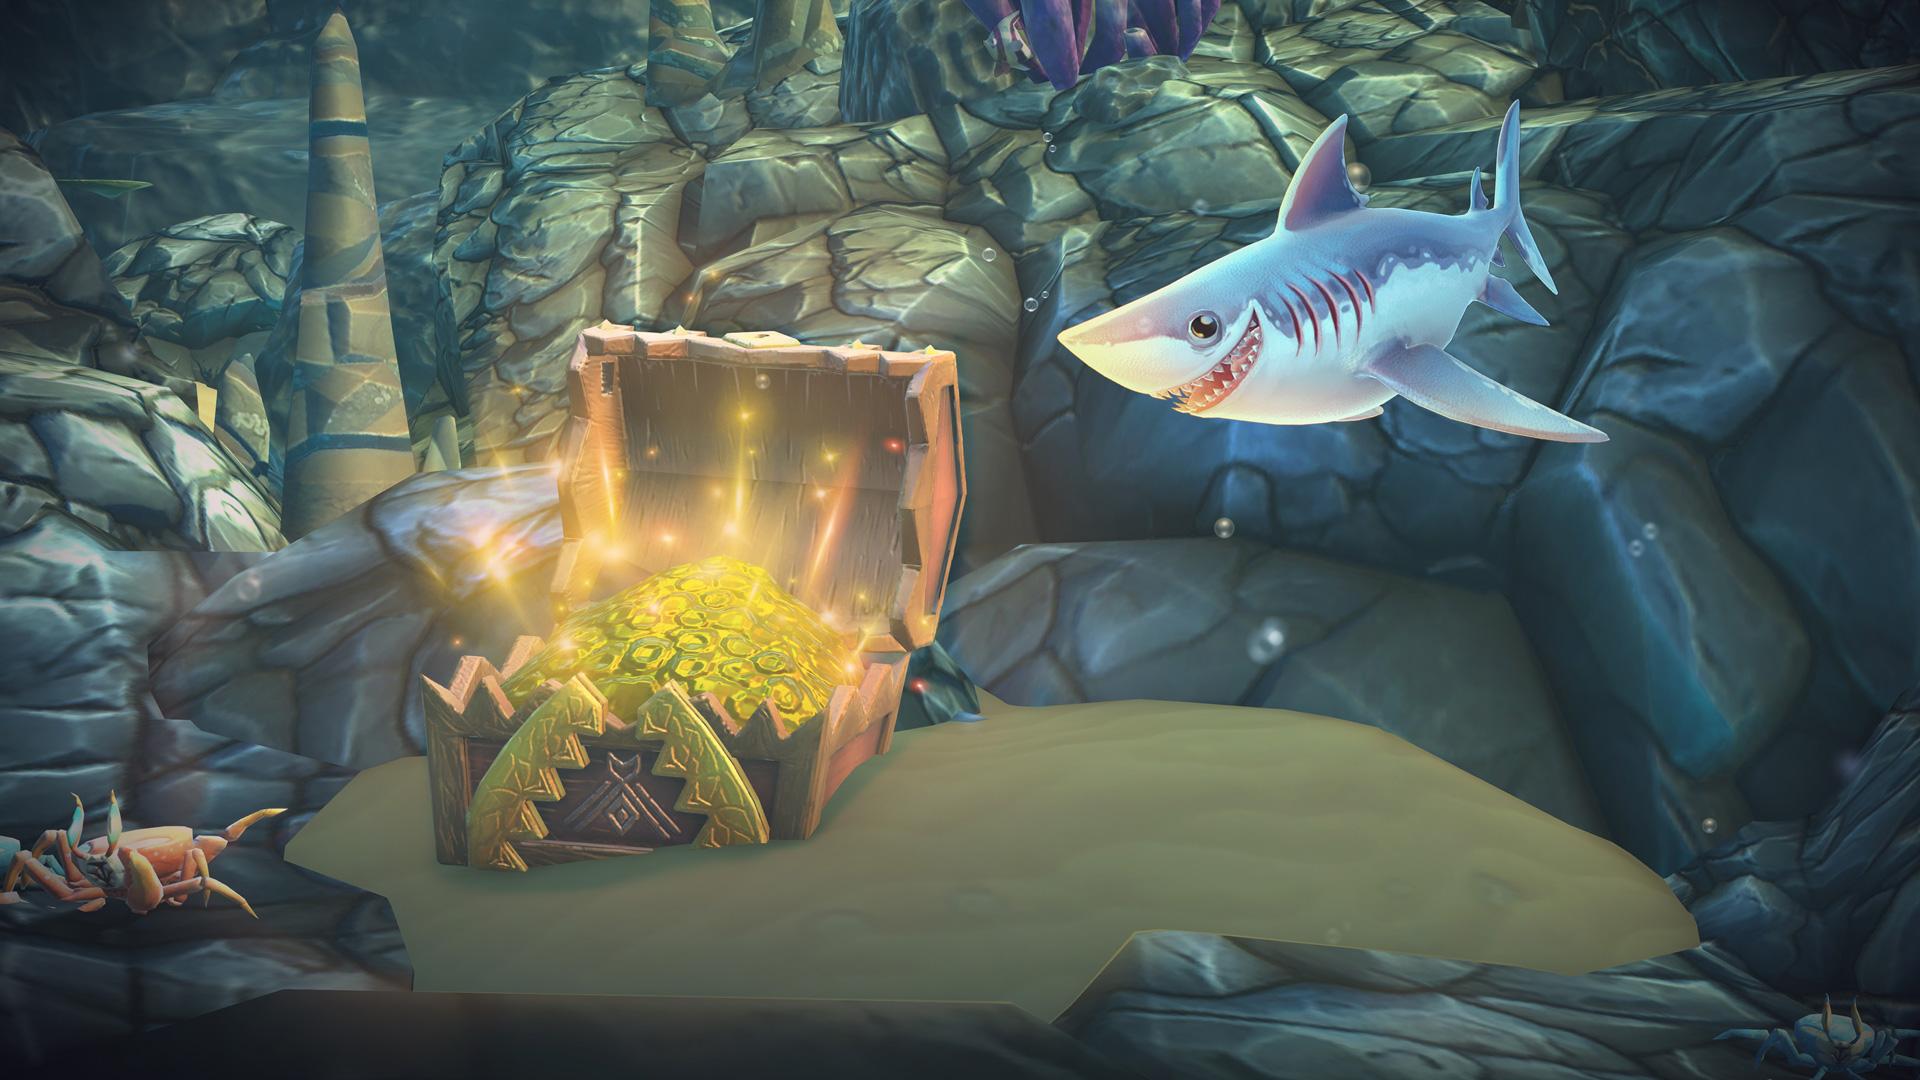 http://www.idgtv.es/archivos/201807/hungry-shark-world-img1.jpg